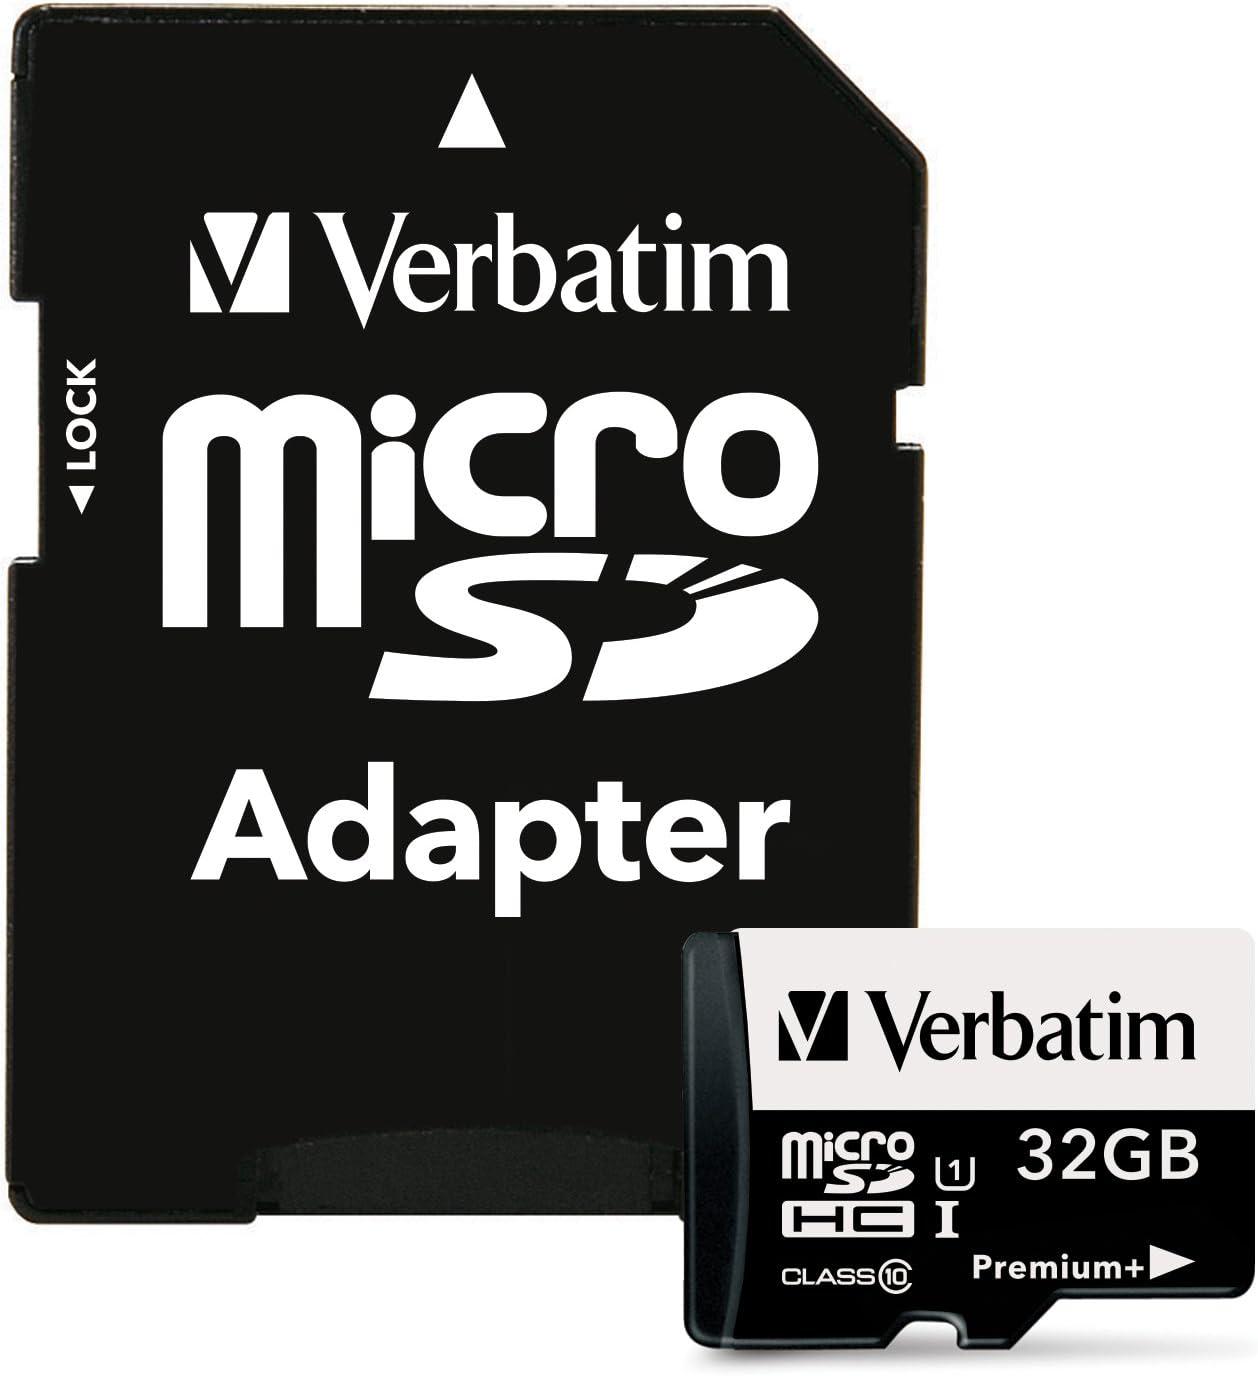 Verbatim 32GB PremiumPlus 533X microSDHC Memory Card with Adapter, UHS-I Class 10, 98741